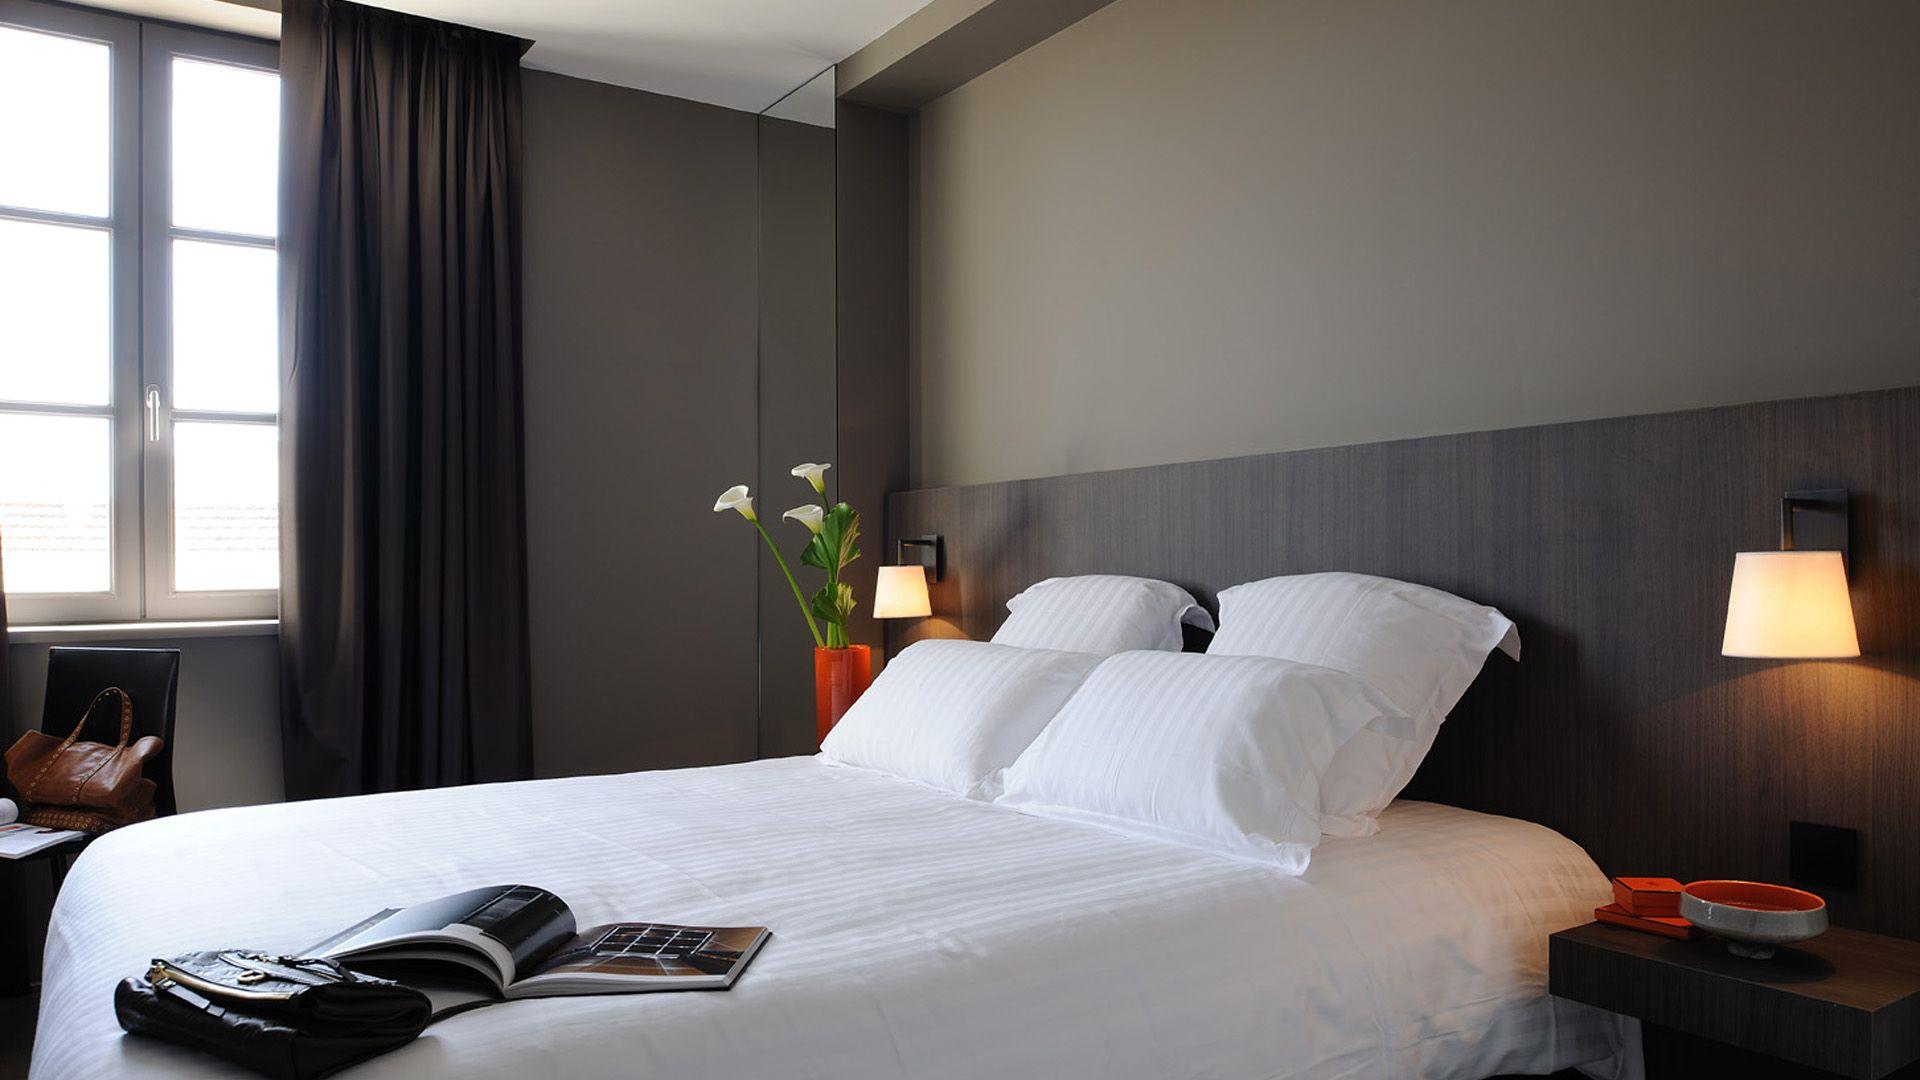 Bedroom interior hd pics claude cartier  bedroom interior  pinterest  cartier bedrooms